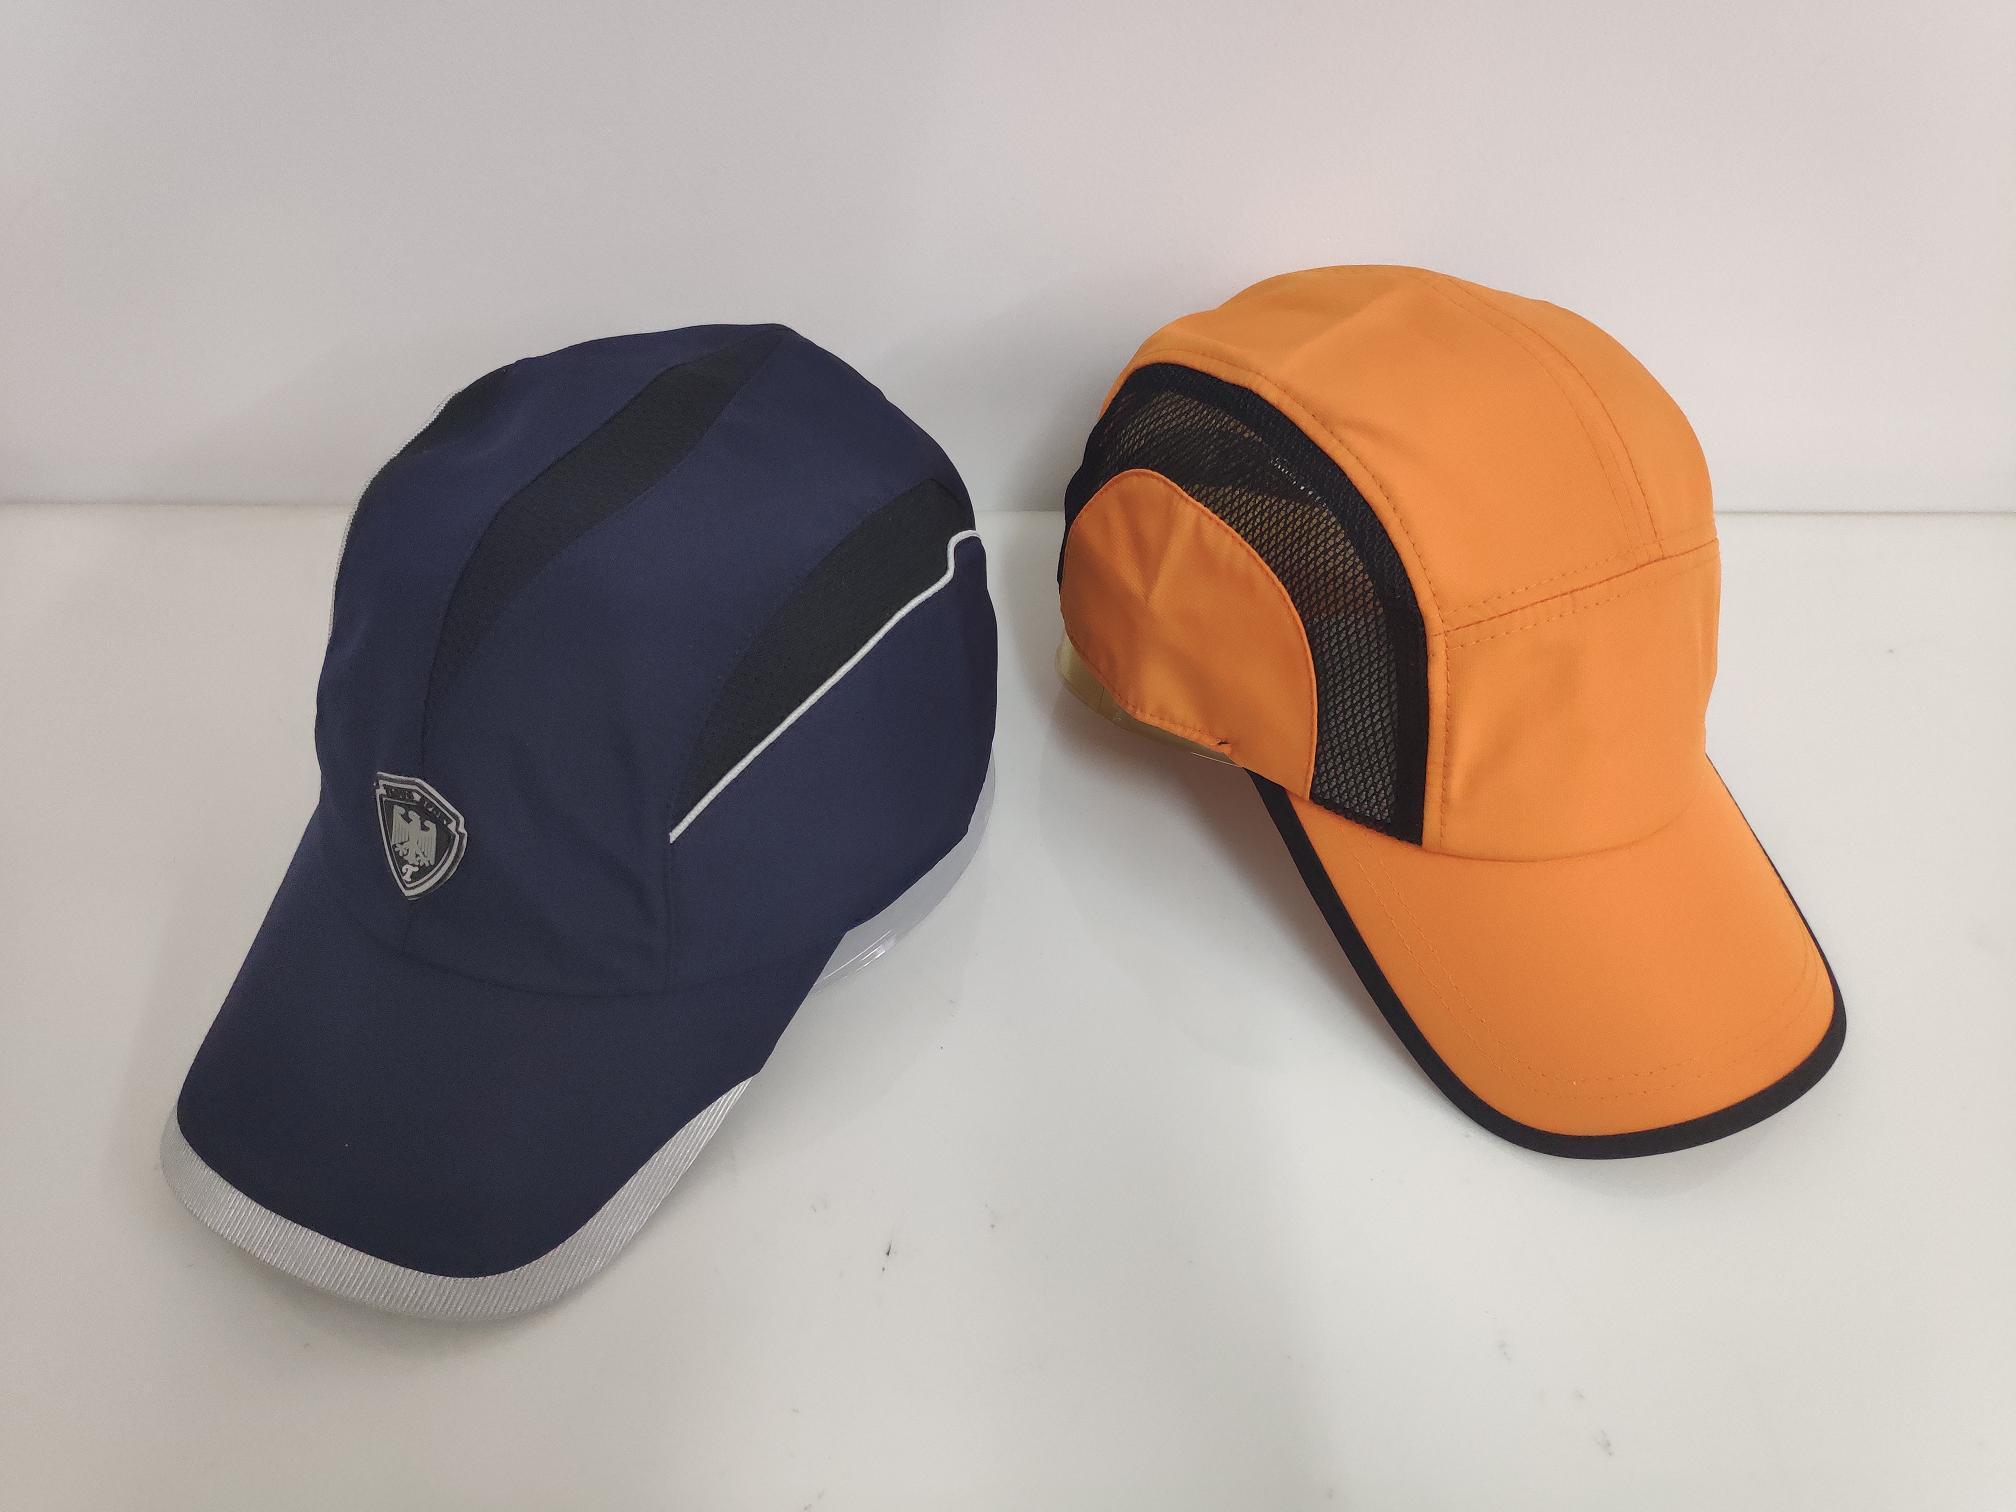 Polyester Micro fiber 6panel baseball cap 5